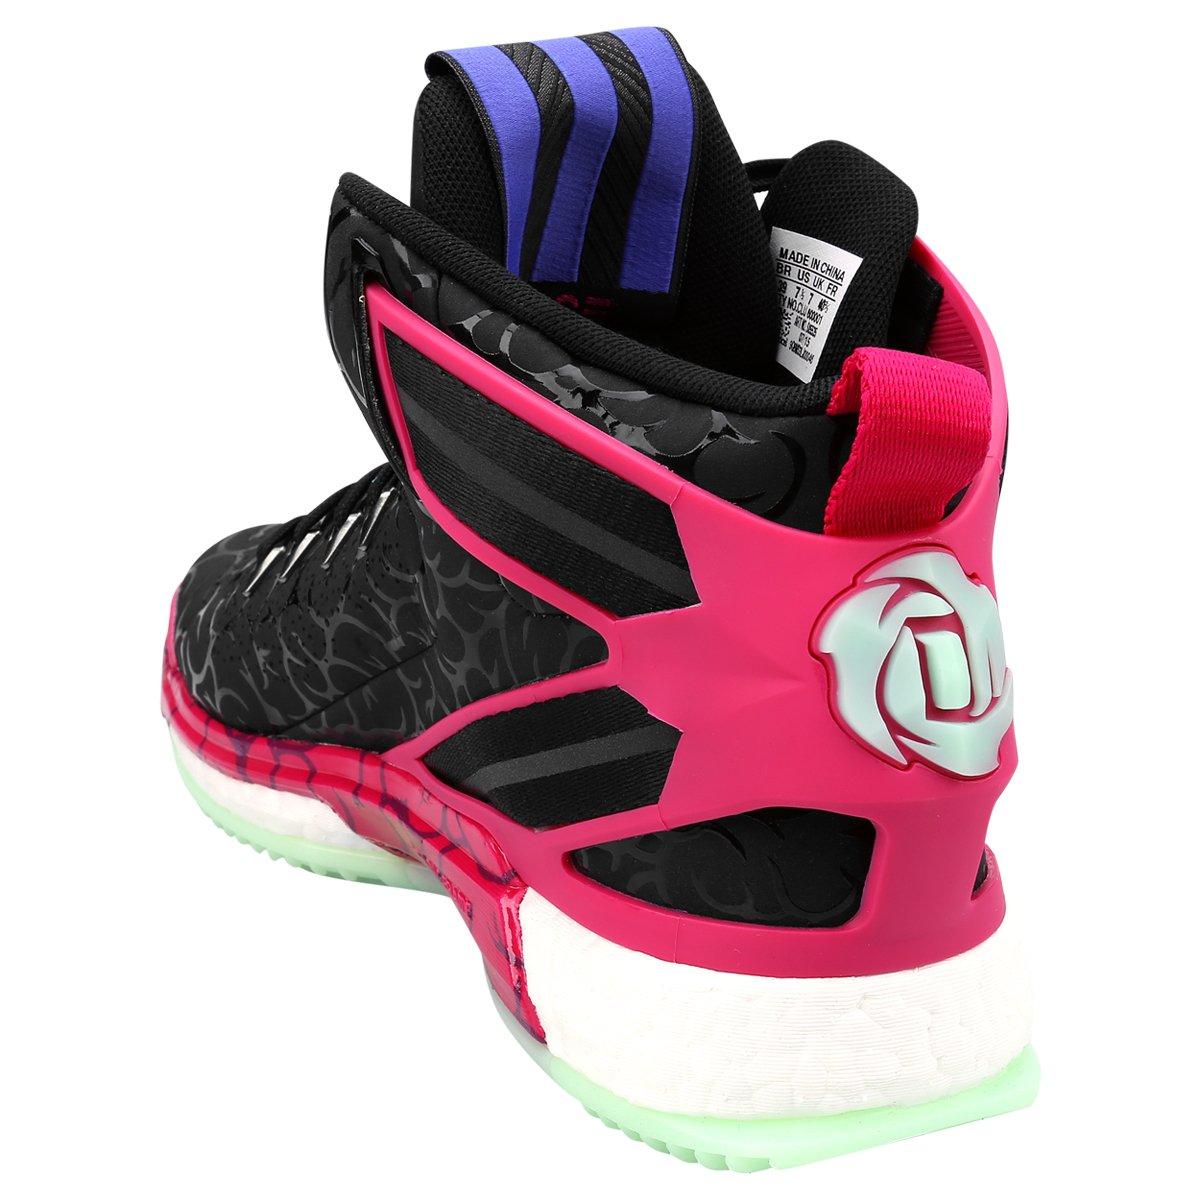 Tênis Cano Alto Adidas Derrick Rose 6 Boost Masculino | Netshoes